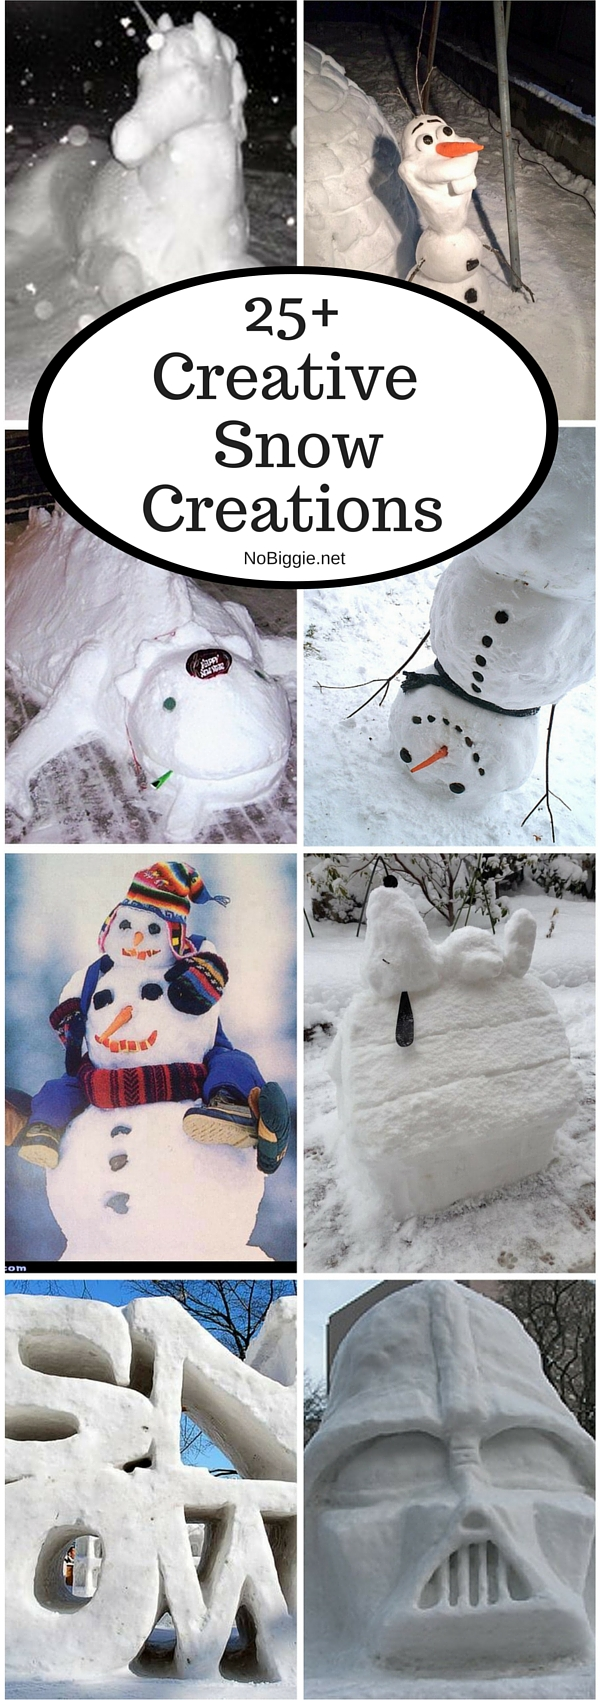 25+Creative Snow Creations